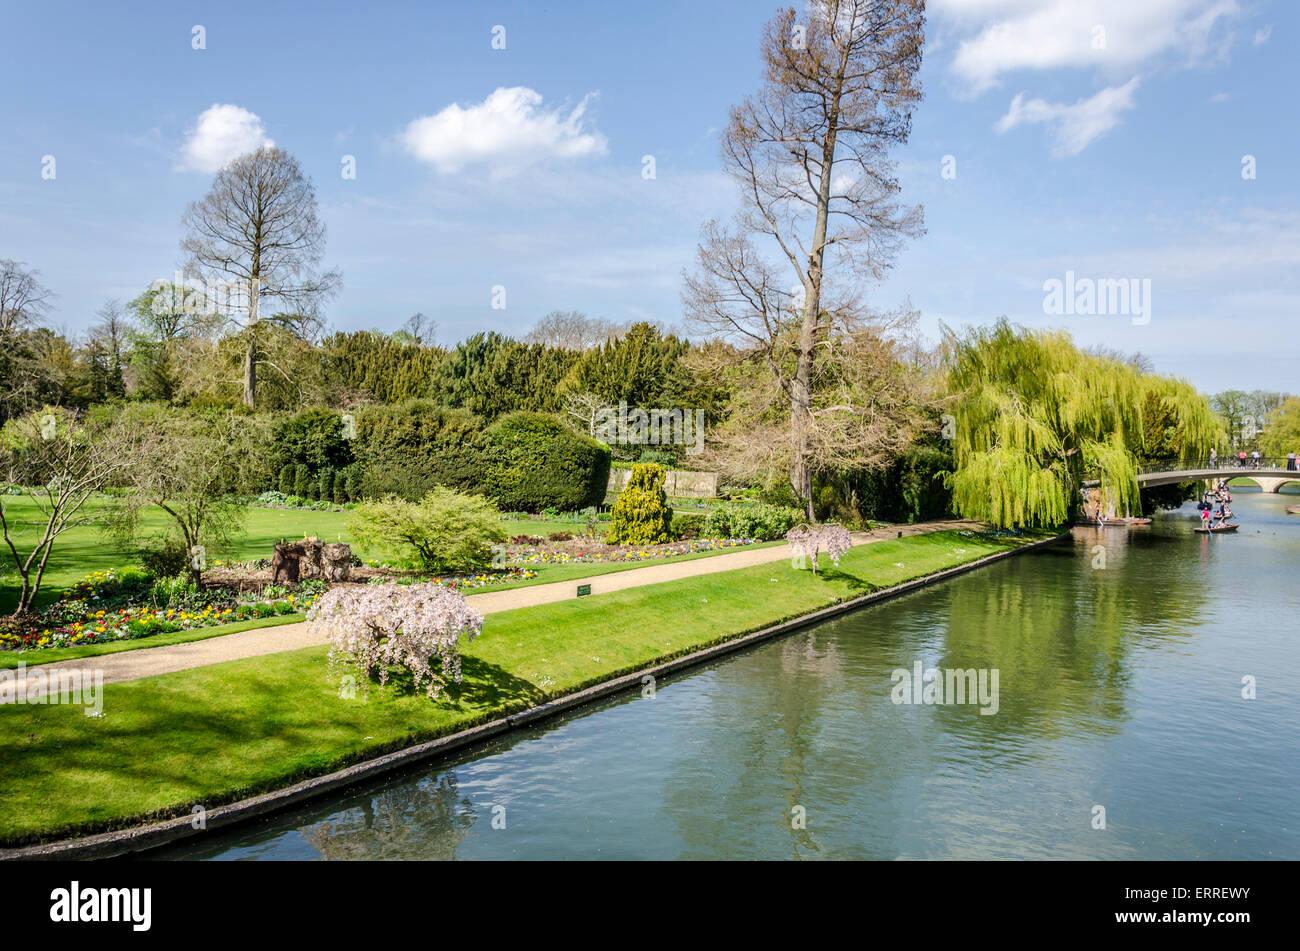 Fellows' Garden Clare College and the River Cam, Cambridge University - Stock Image